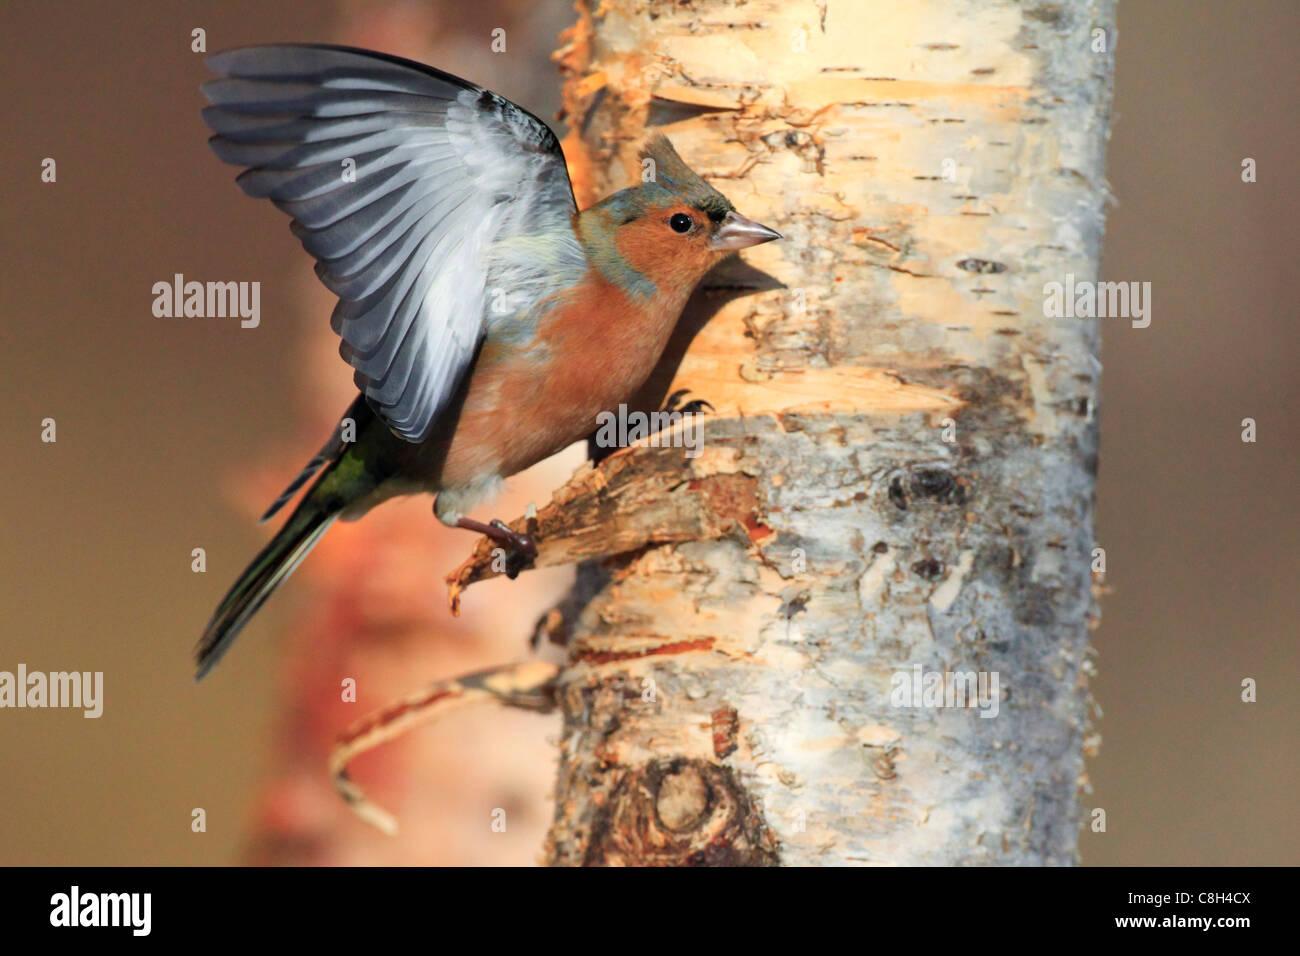 Flight, tree, movement, chaffinch, Cairngorms, national park, food, eating, flight, wing, Fringilla coelebs, feed, - Stock Image